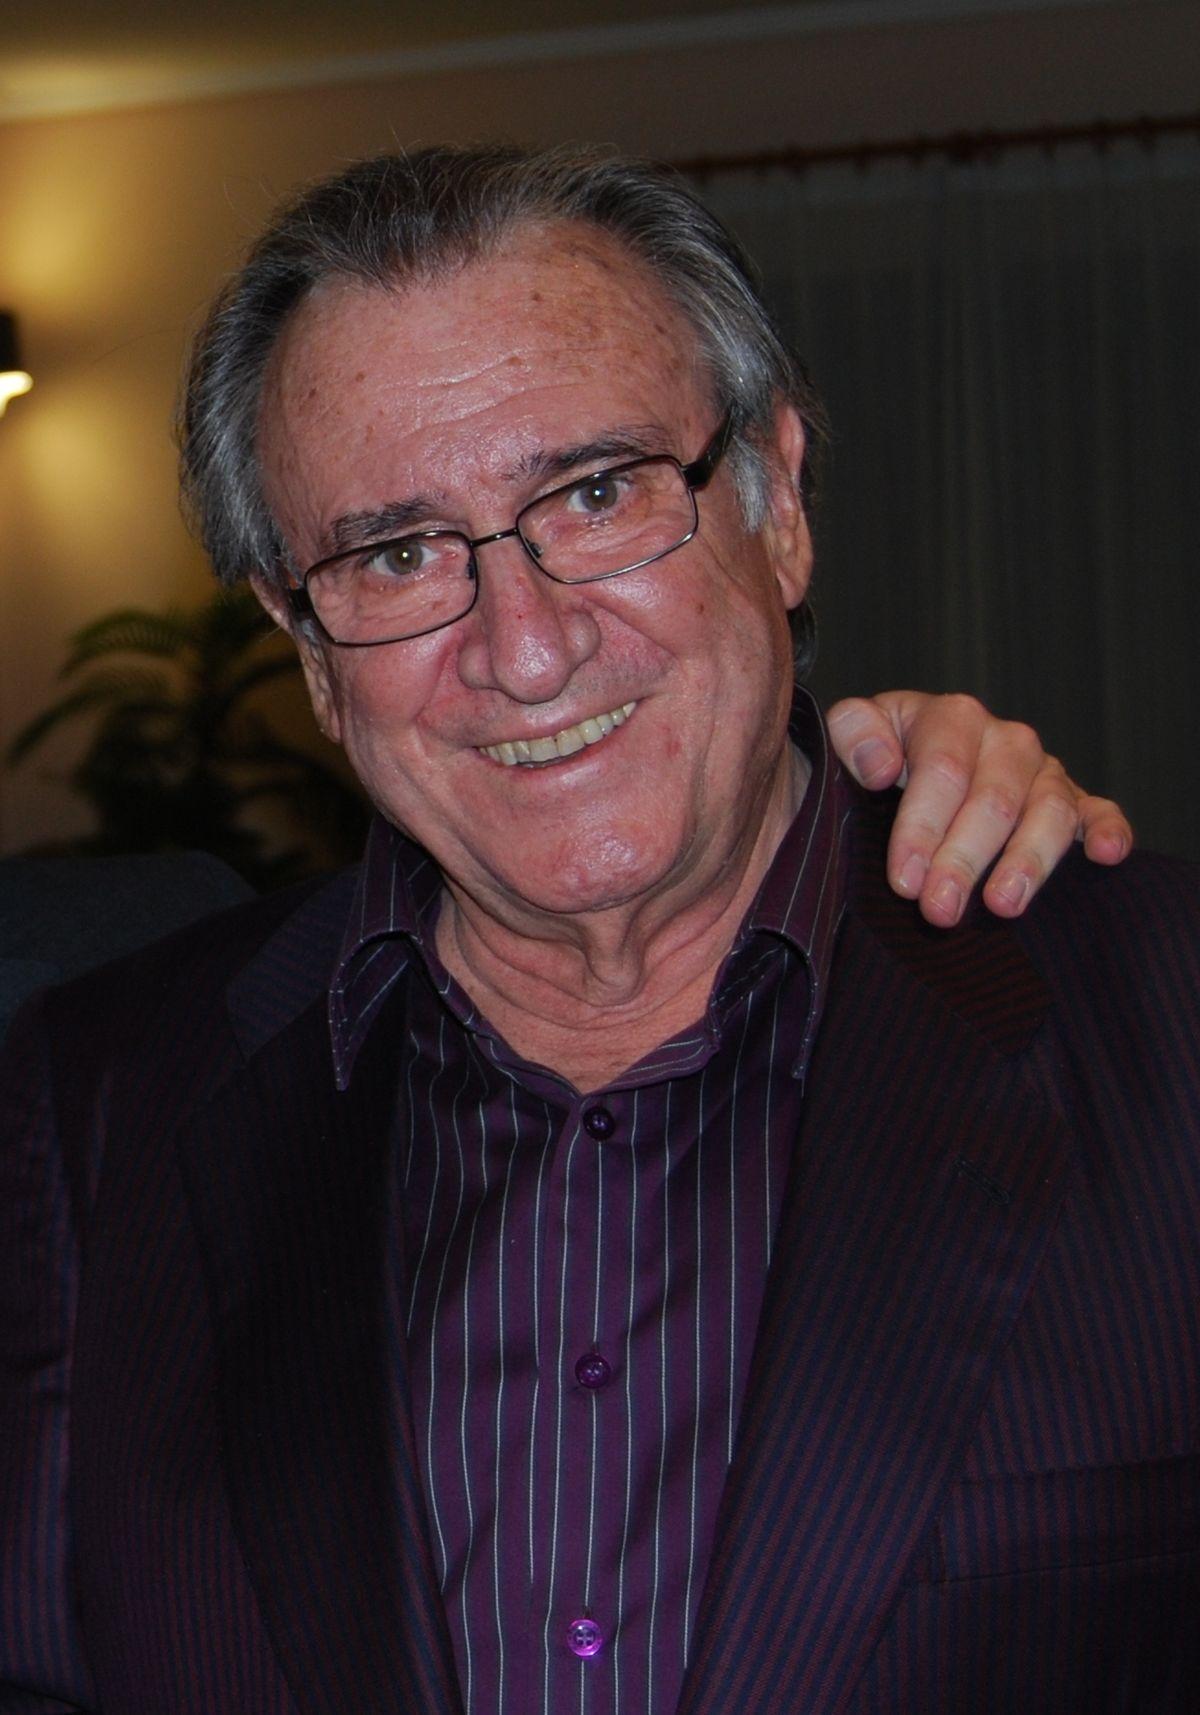 Manolo Manolo